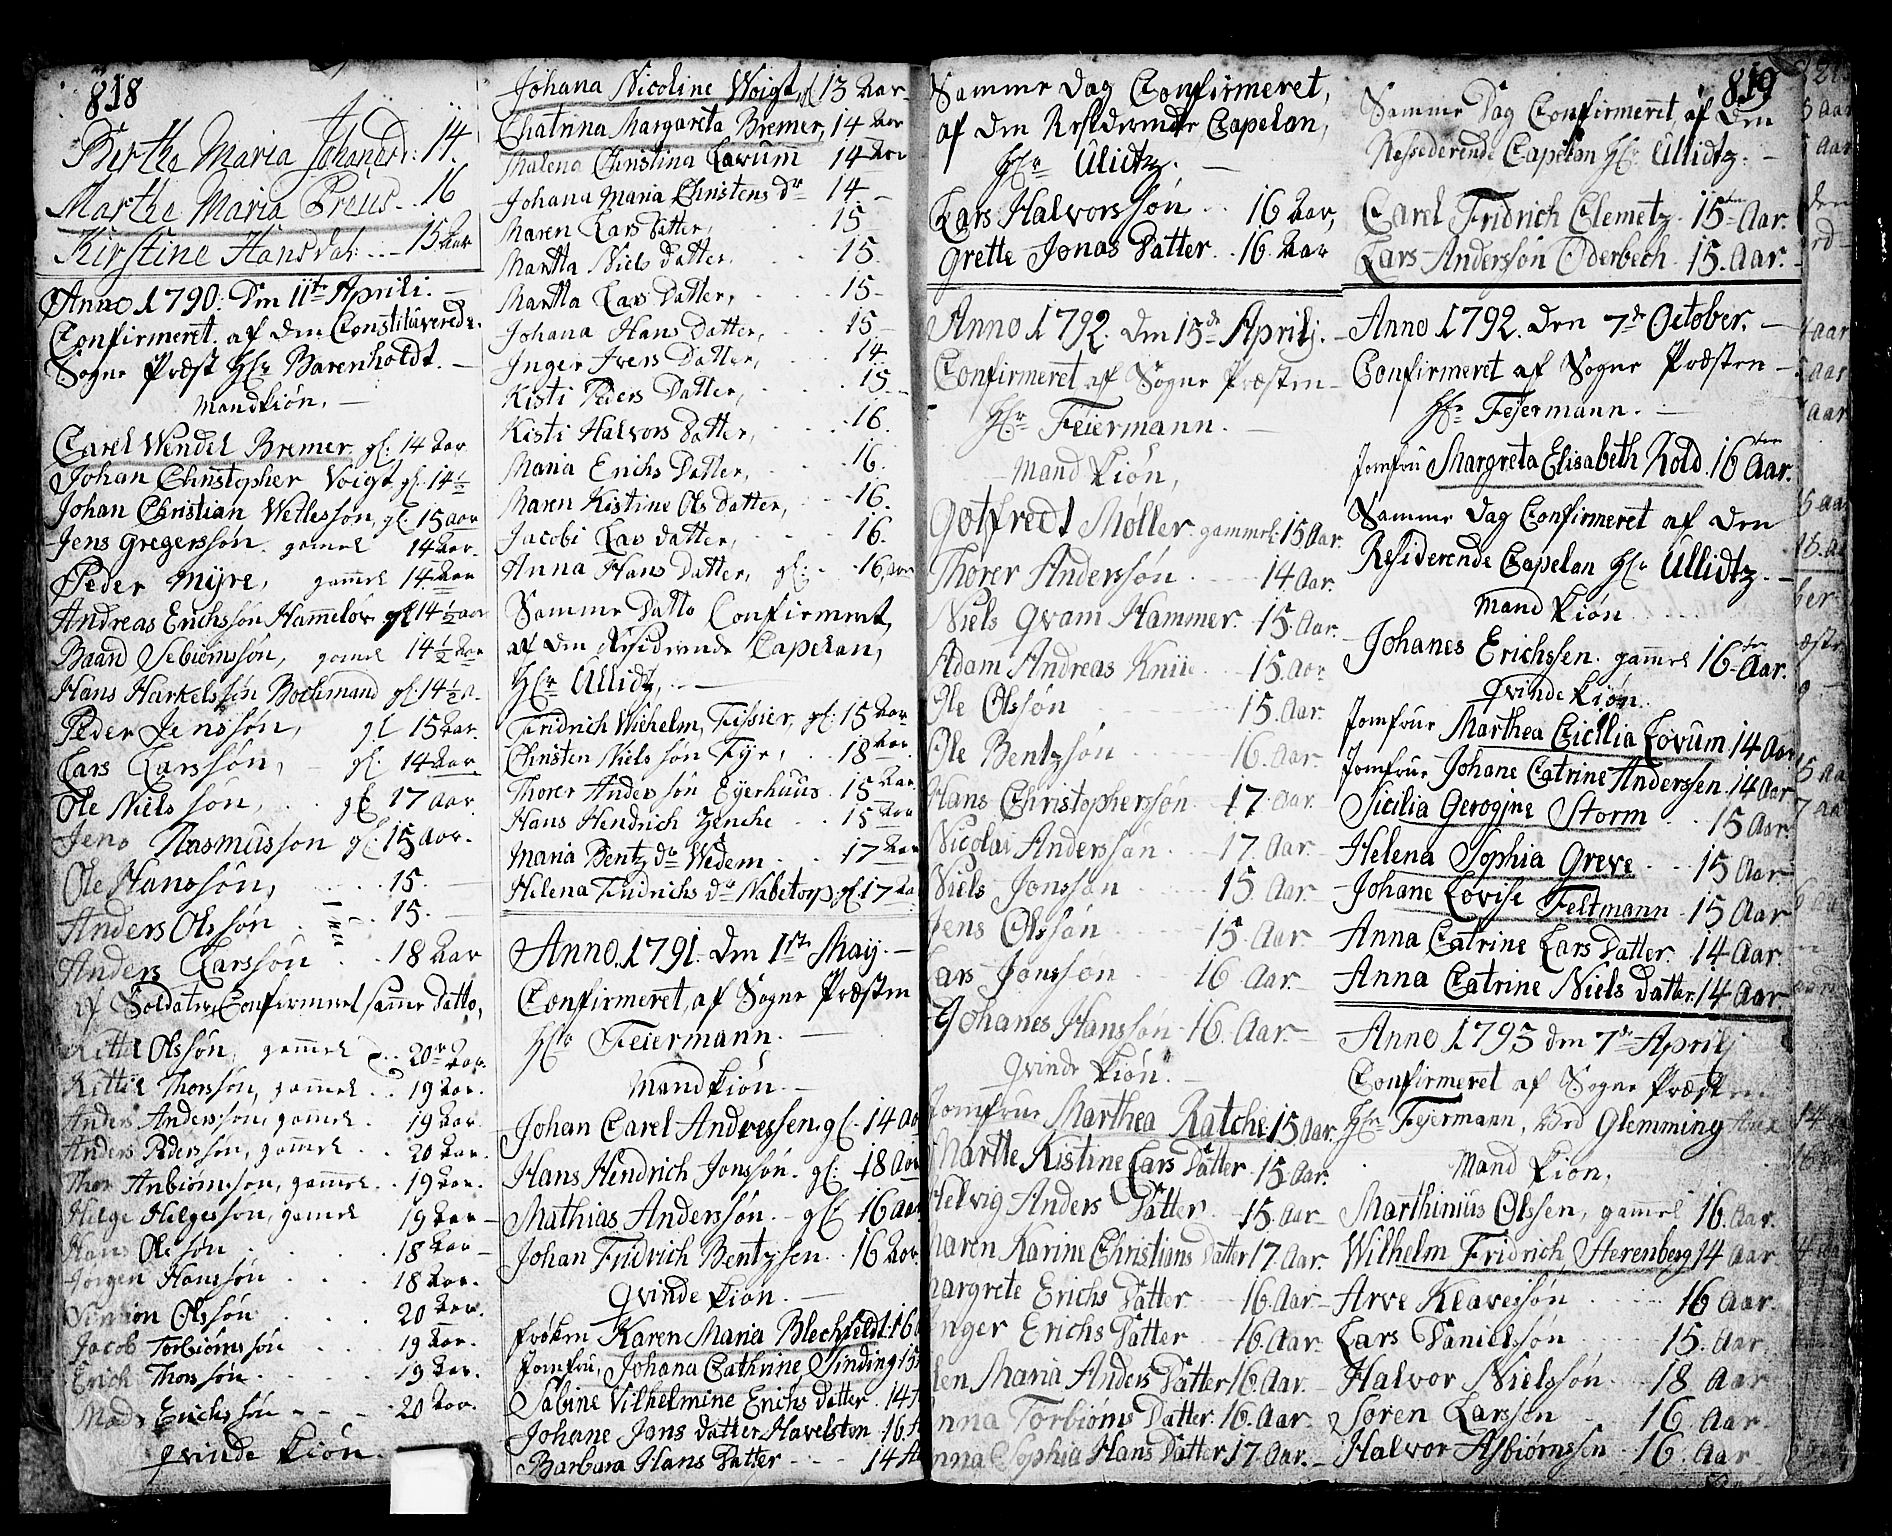 SAO, Fredrikstad prestekontor Kirkebøker, F/Fa/L0002: Ministerialbok nr. 2, 1750-1804, s. 818-819